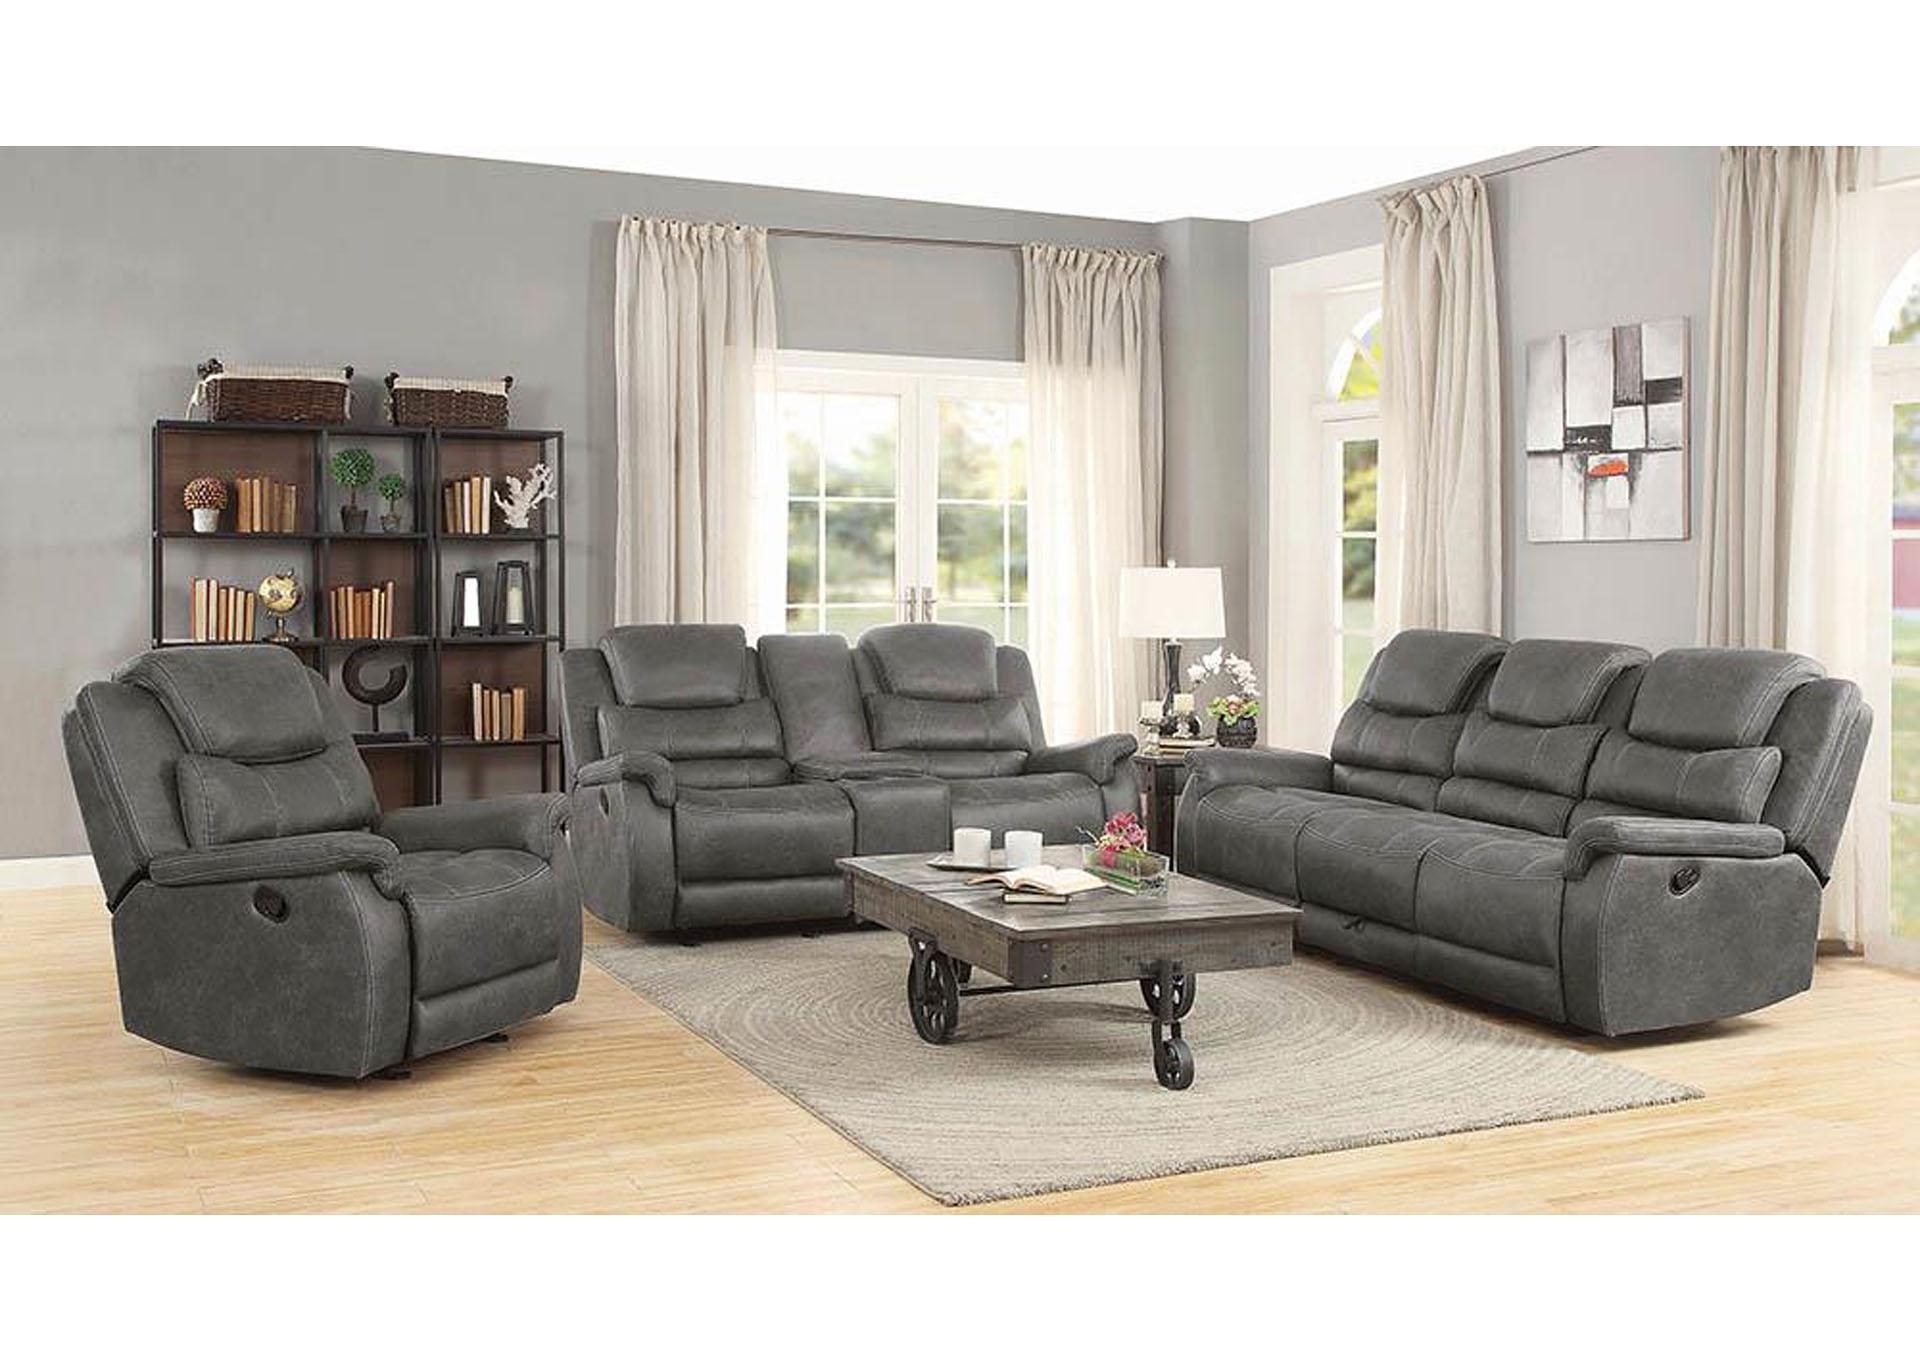 Admirable Austins Couch Potatoes Furniture Stores Austin Texas Grey Uwap Interior Chair Design Uwaporg